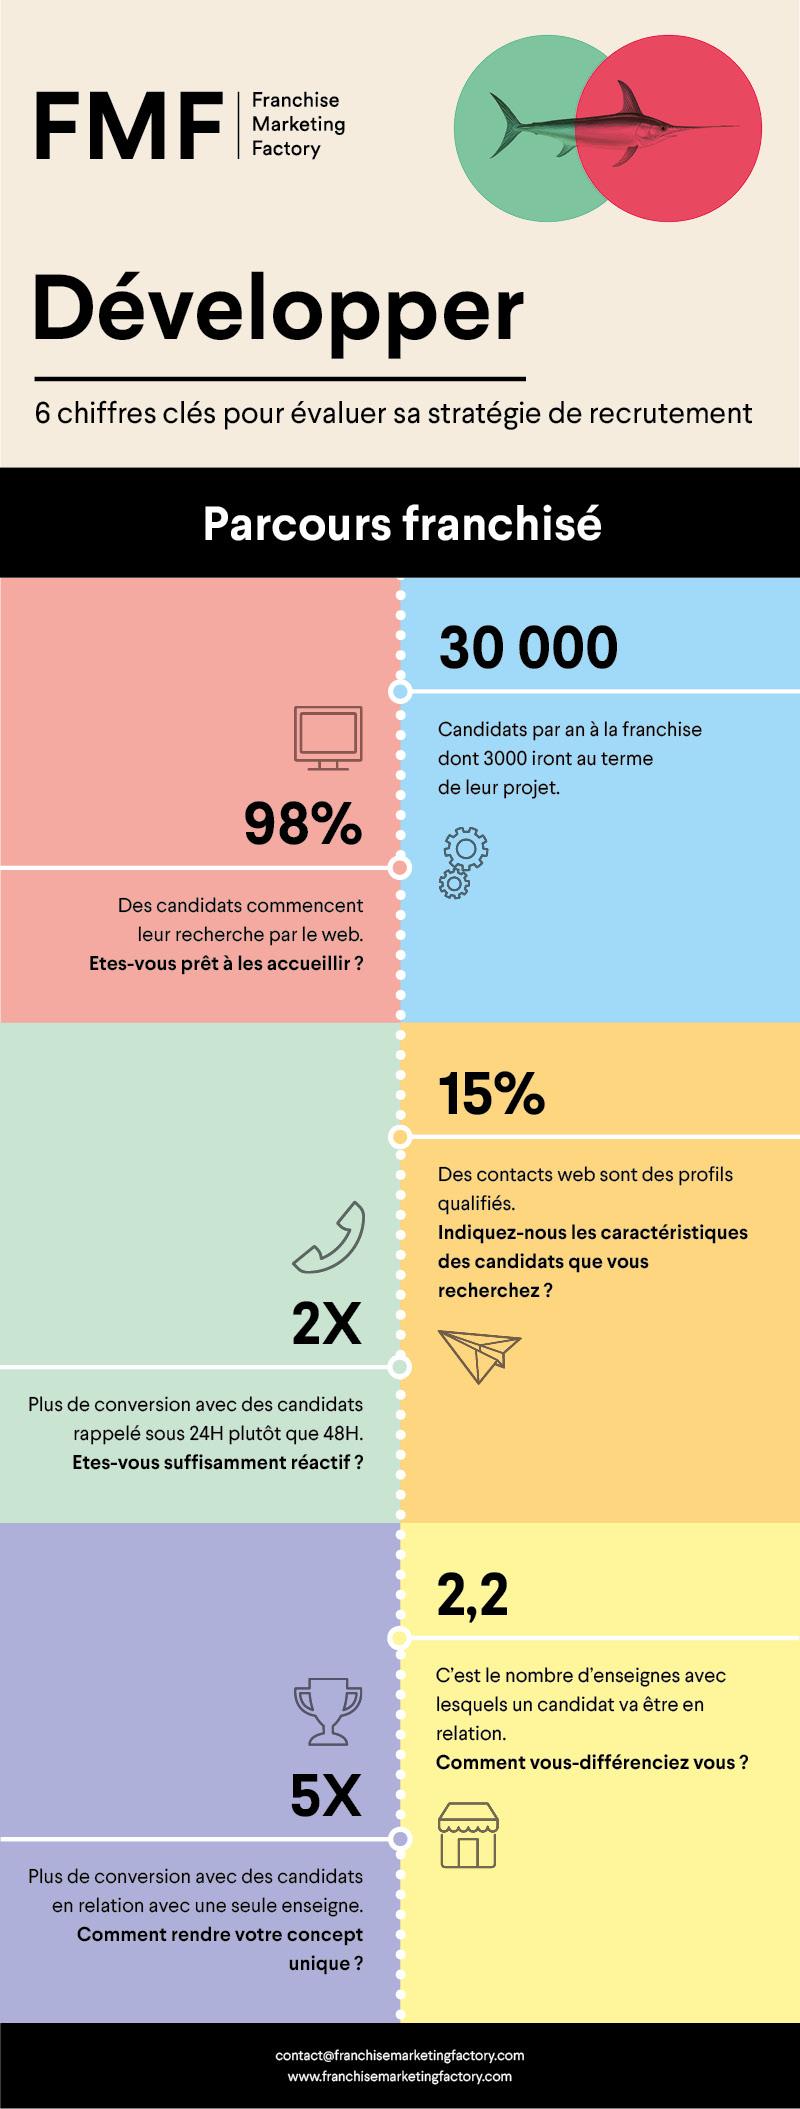 Infographie FMF - stratégie de recrutement